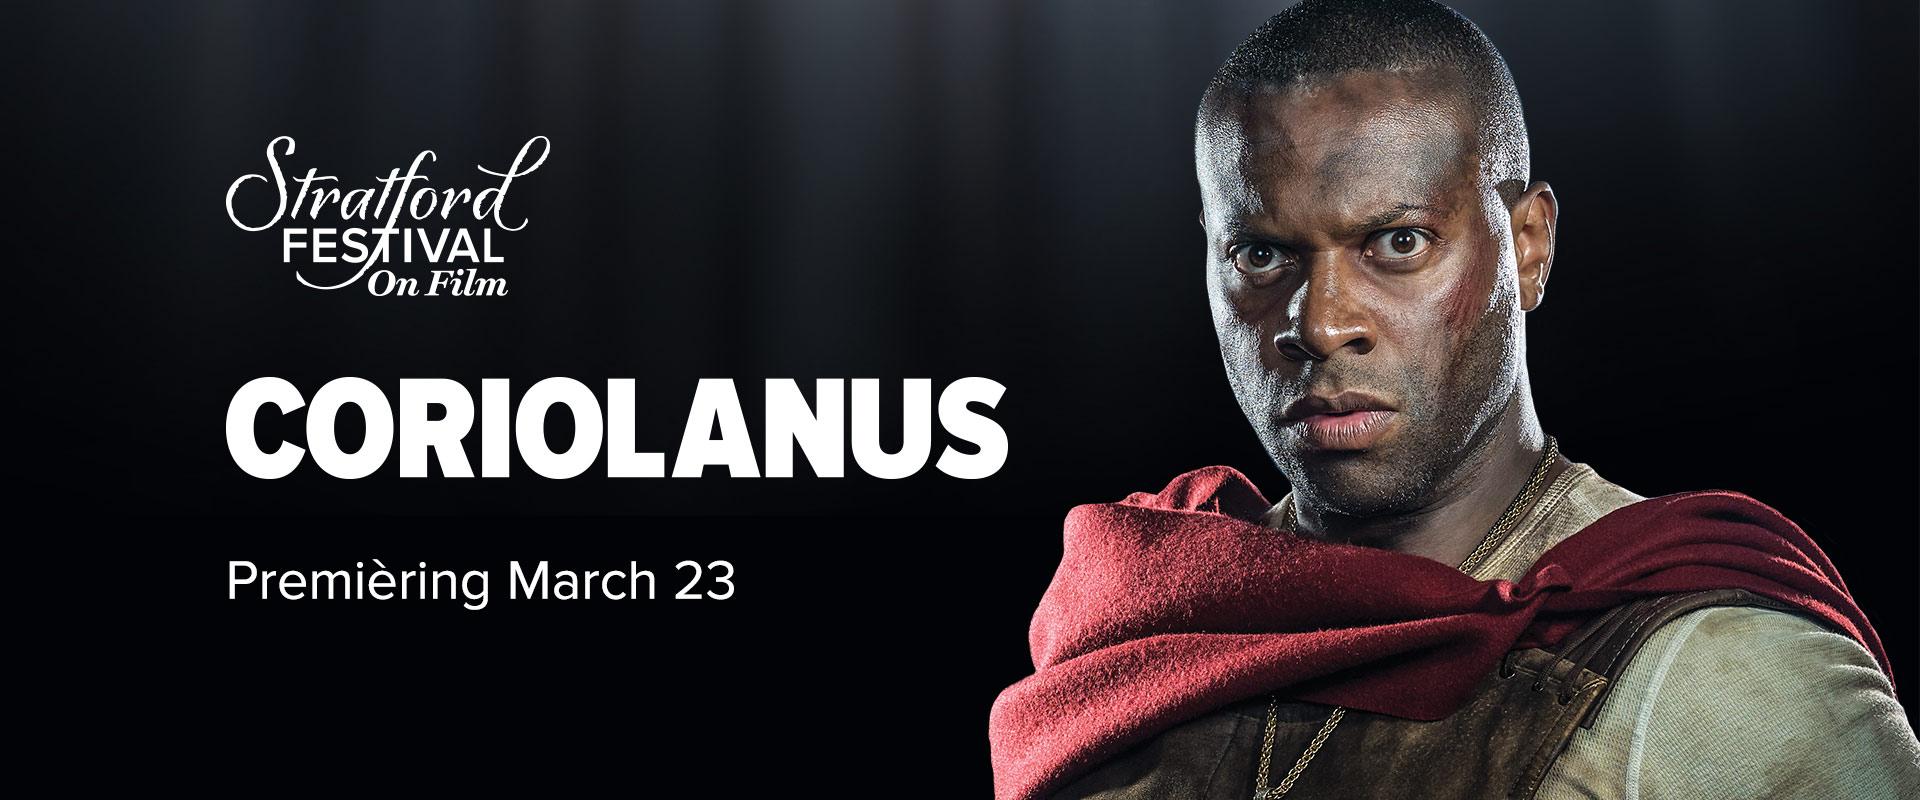 Publicity image from Coriolanus